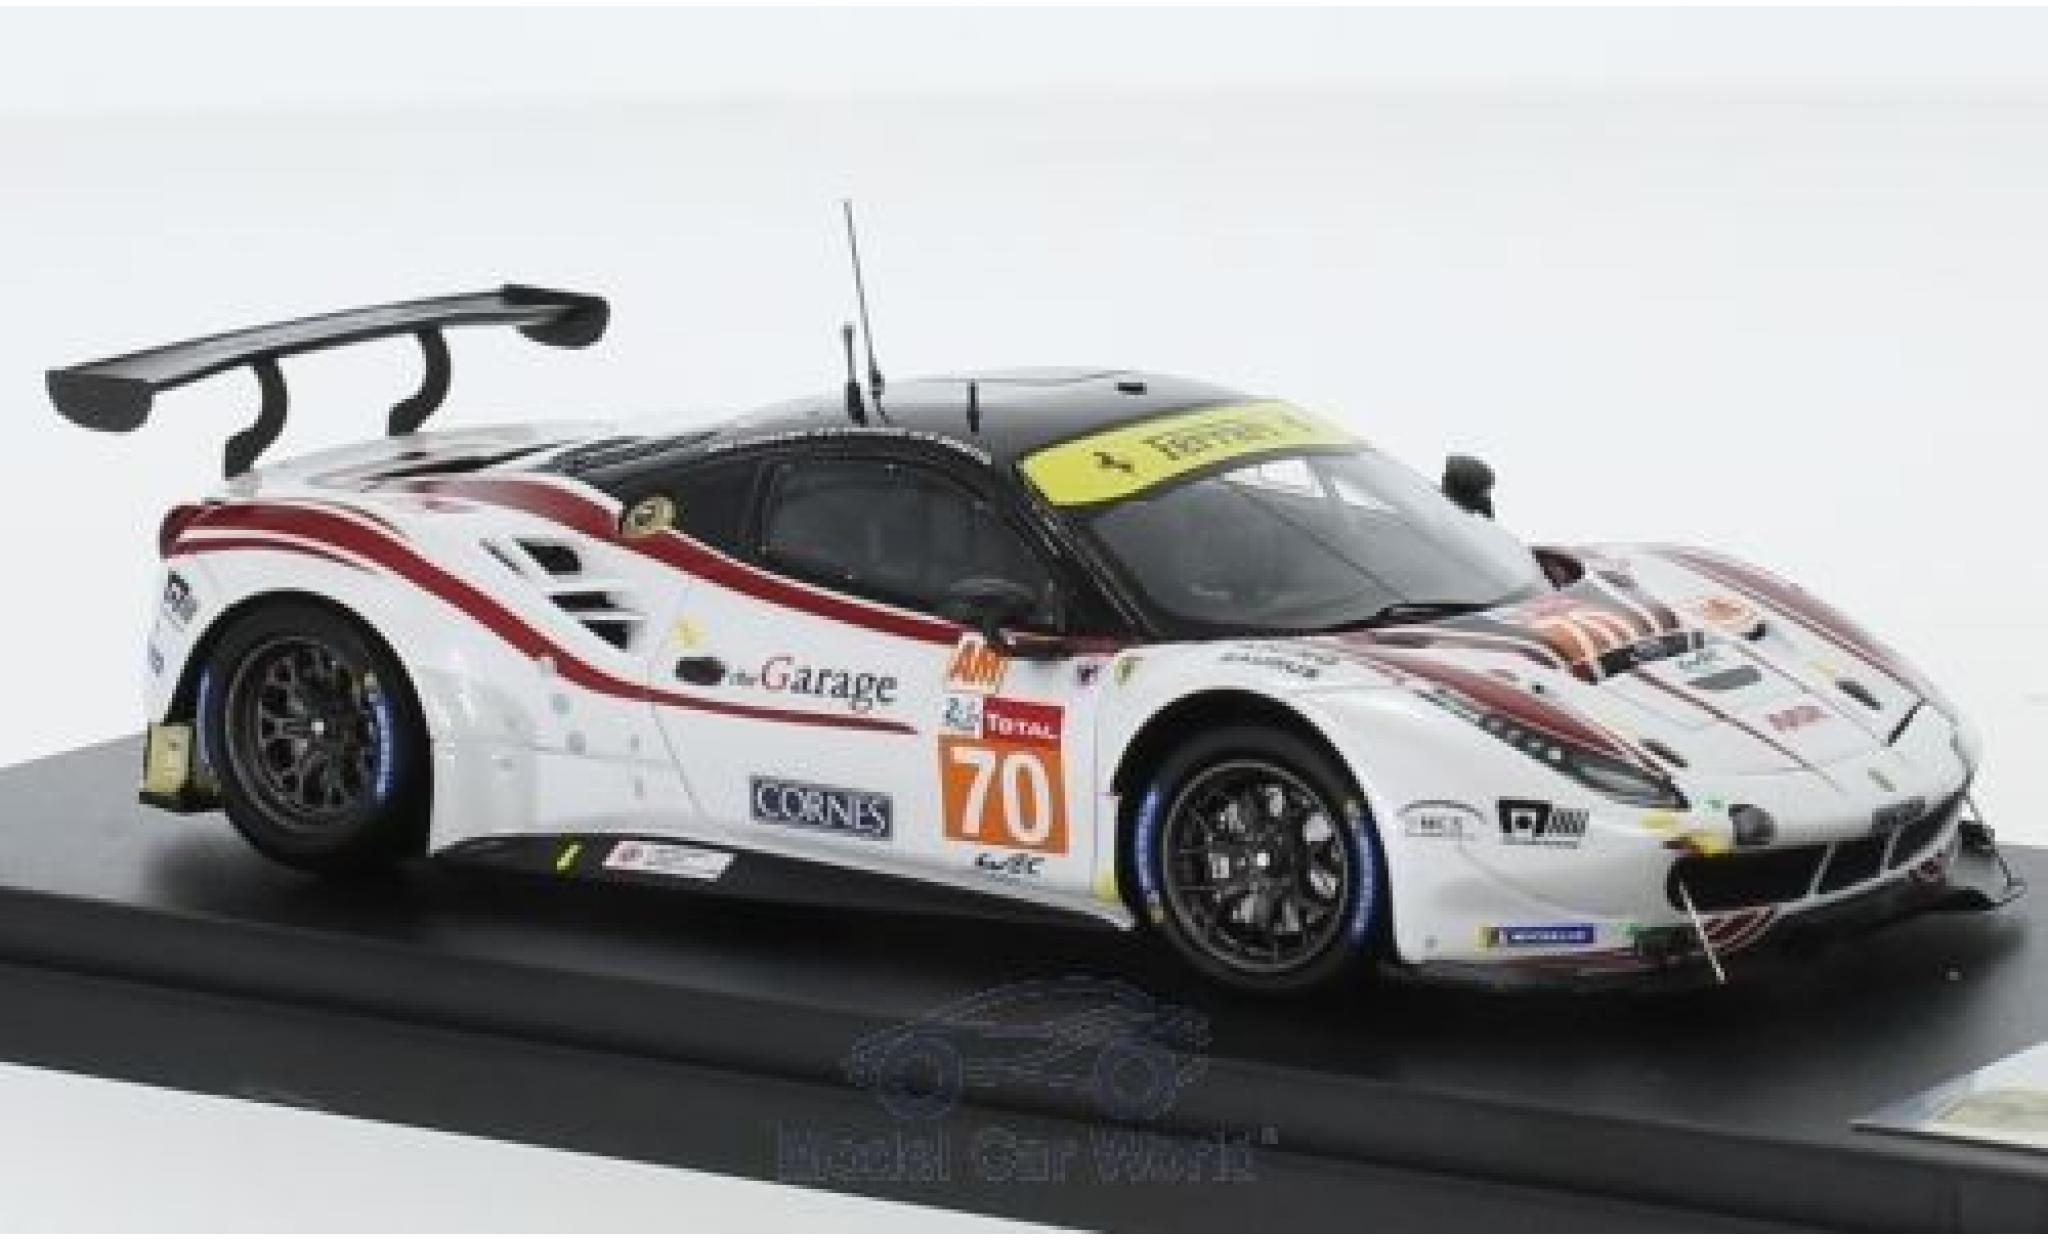 Ferrari 488 1/43 Look Smart GTE No.70 MR Racing 24h Le Mans 2018 M. Ishikawa/O.Beretta/E.Cheever